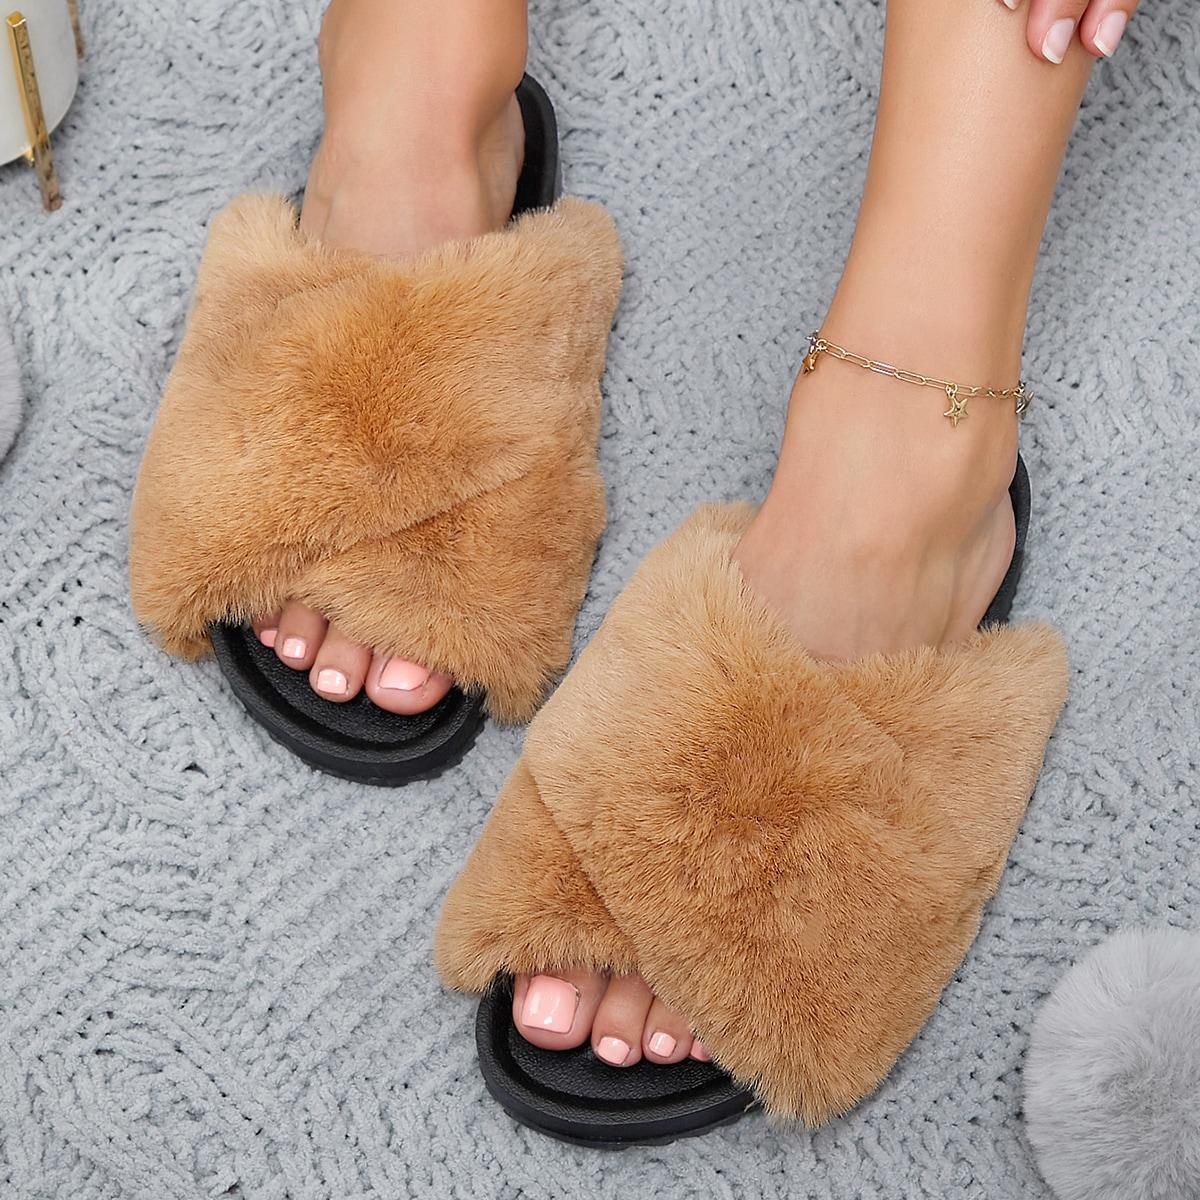 SHEIN / Vegan Fur Crisscross Open-Toe Slipper Sandals